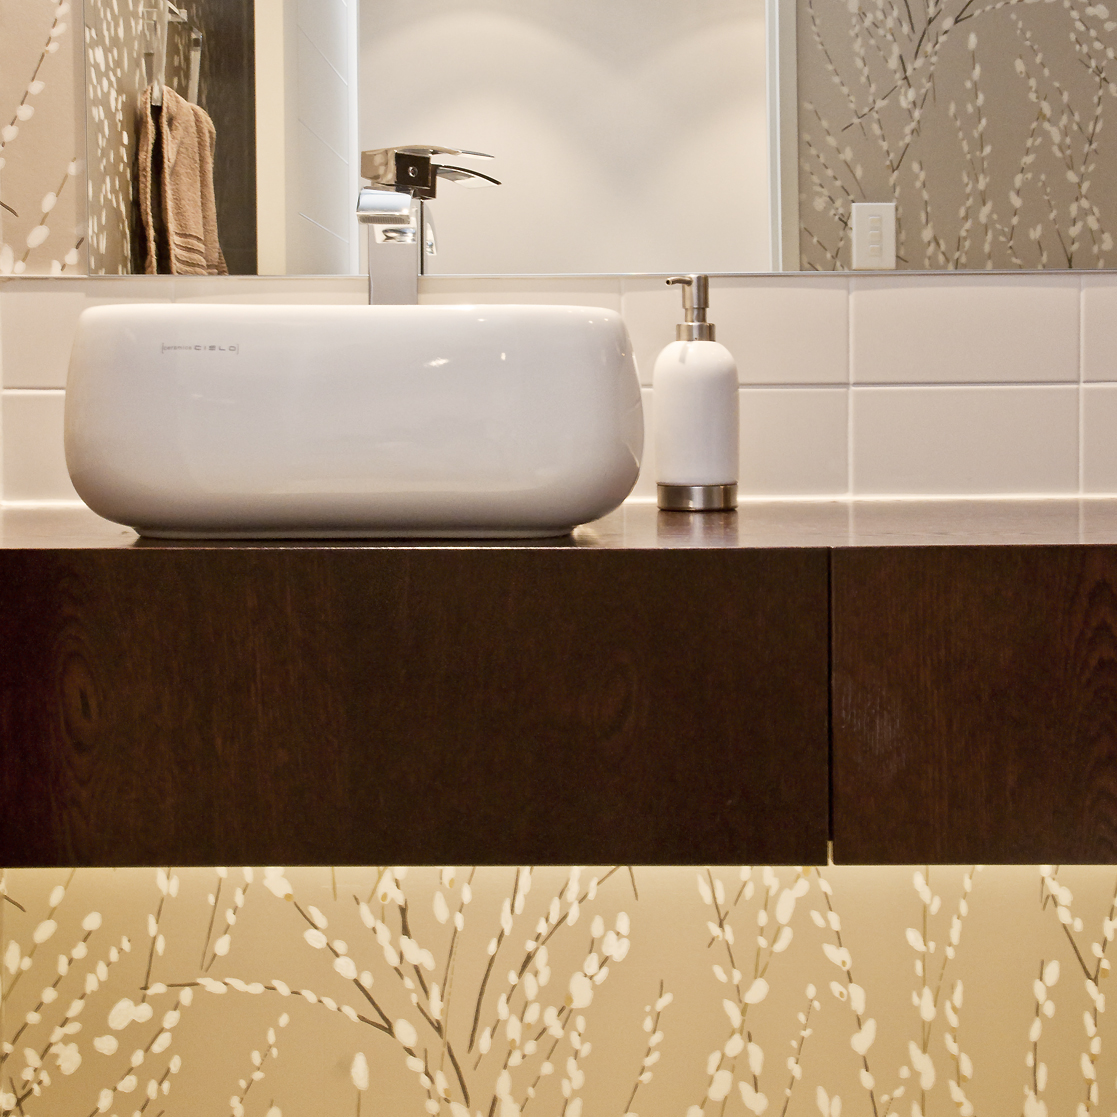 Image 3 Bathroom.jpg